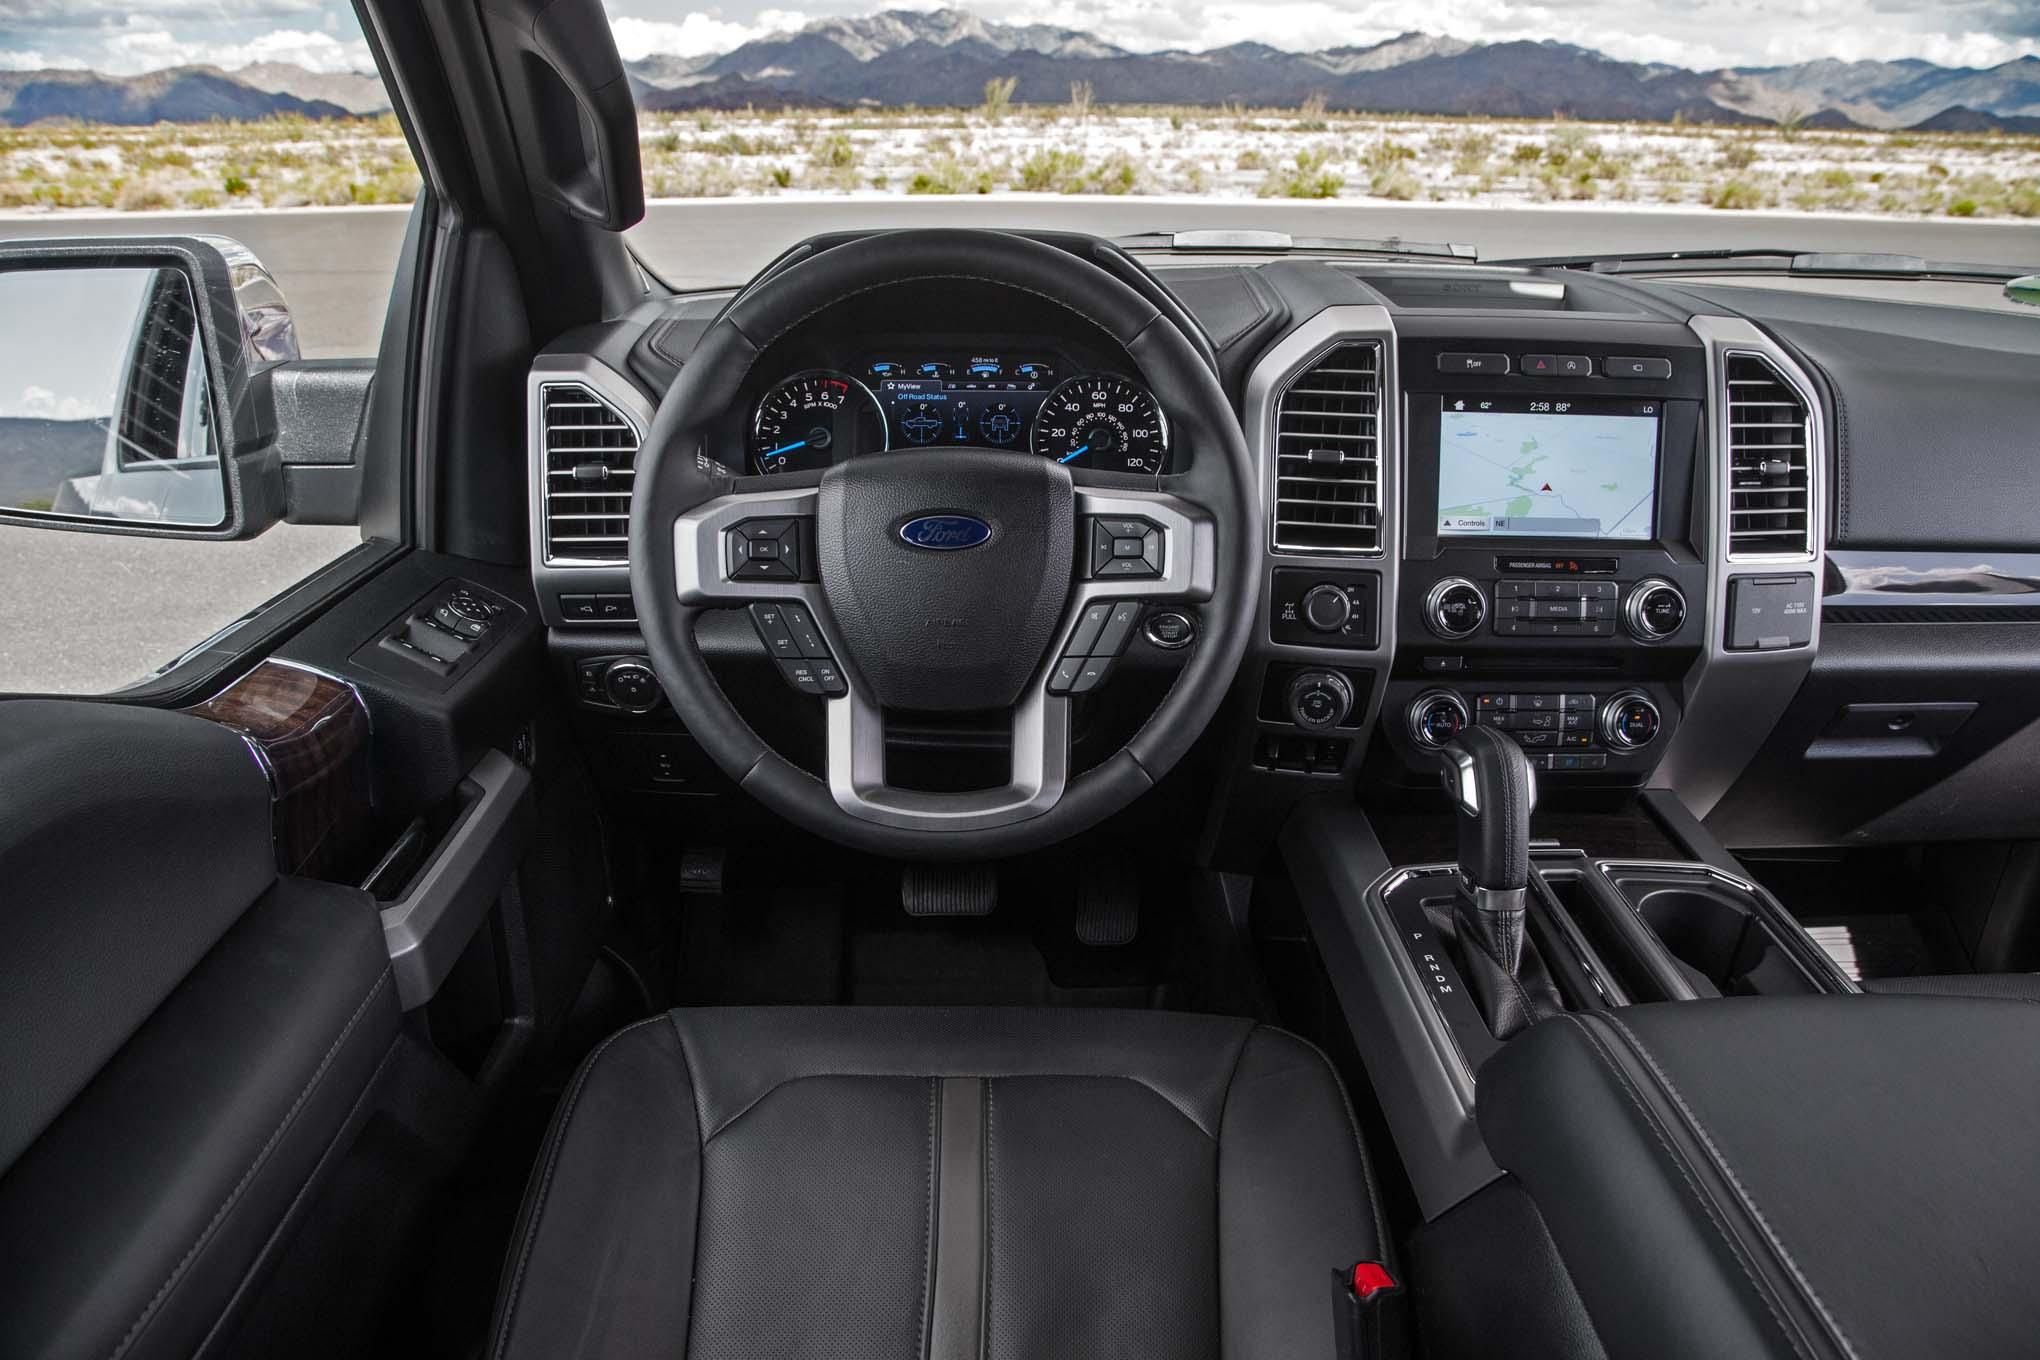 Ford F-150: Finalista a la Camioneta del Año de Motor ...